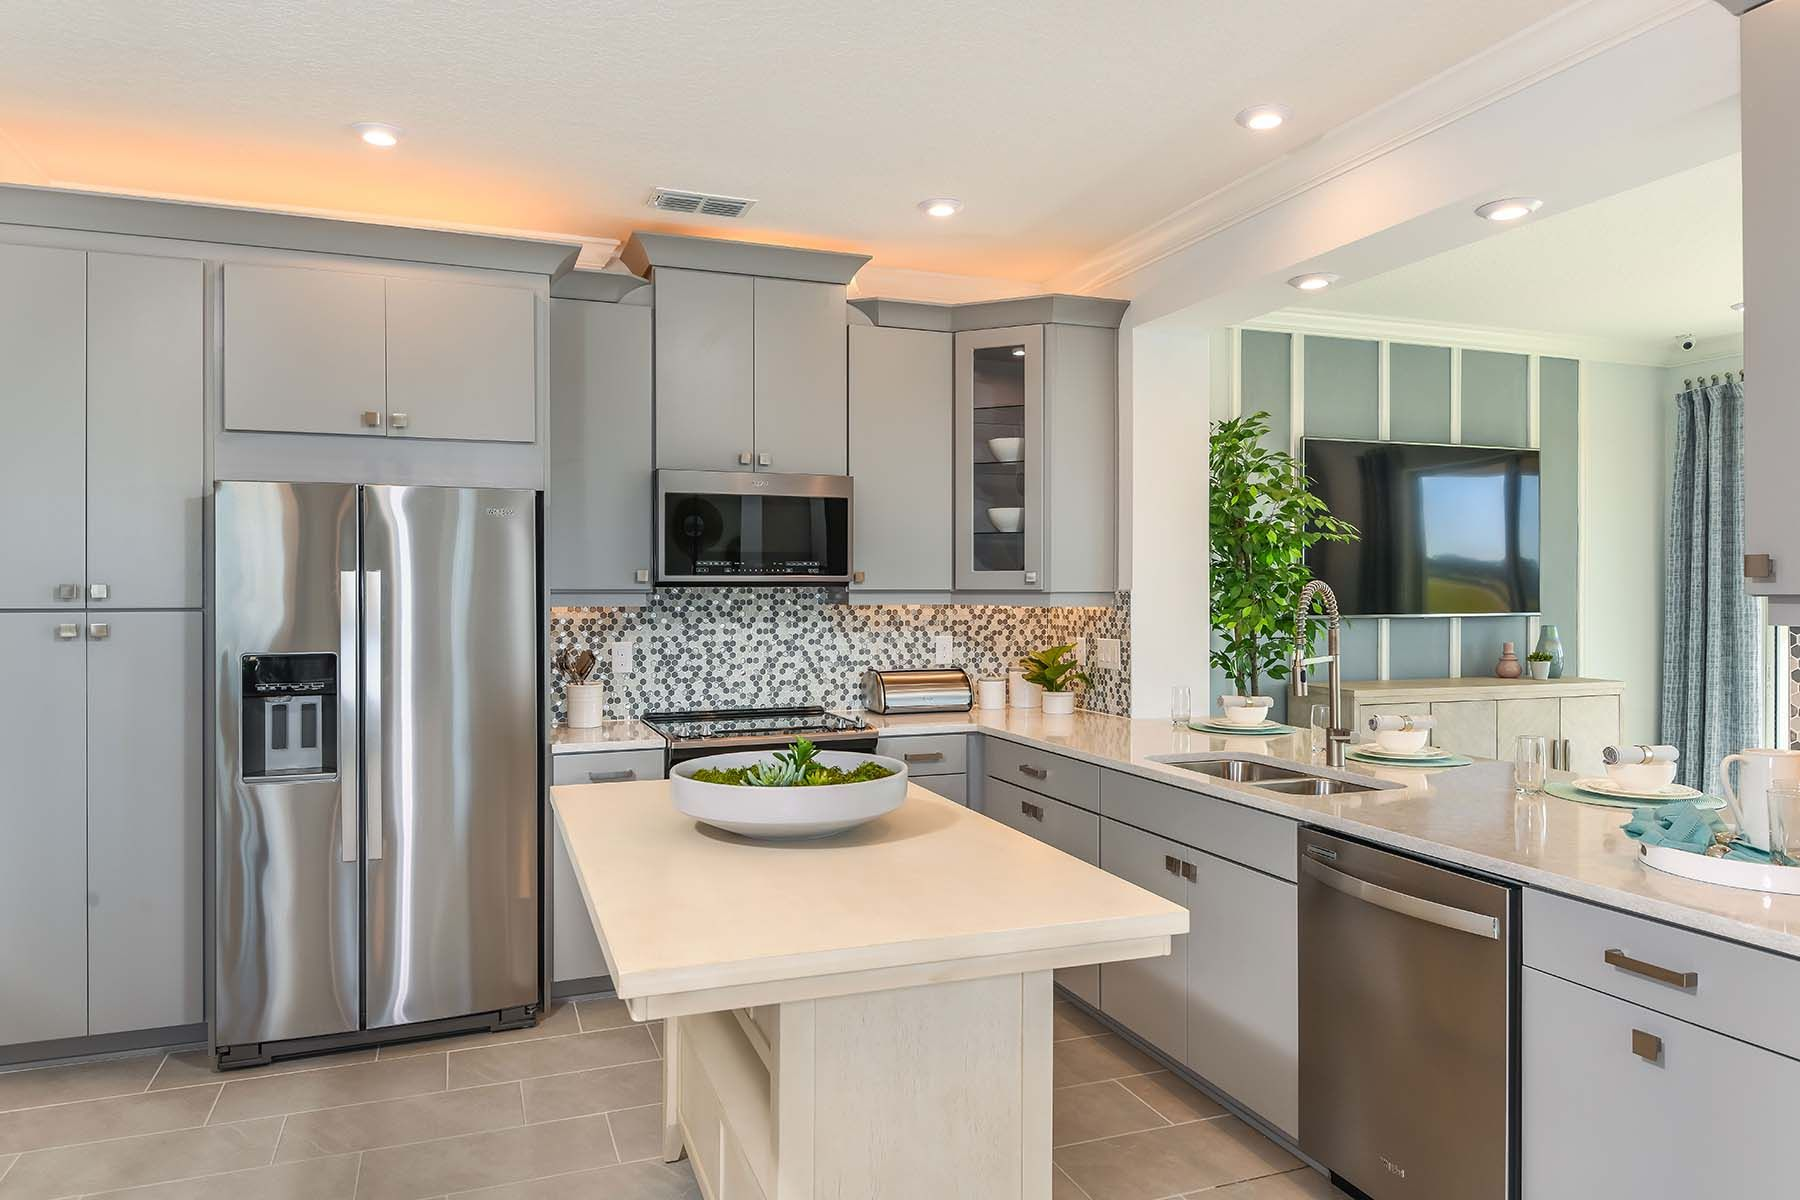 Kitchen featured in the Seaside II End By Mattamy Homes in Sarasota-Bradenton, FL